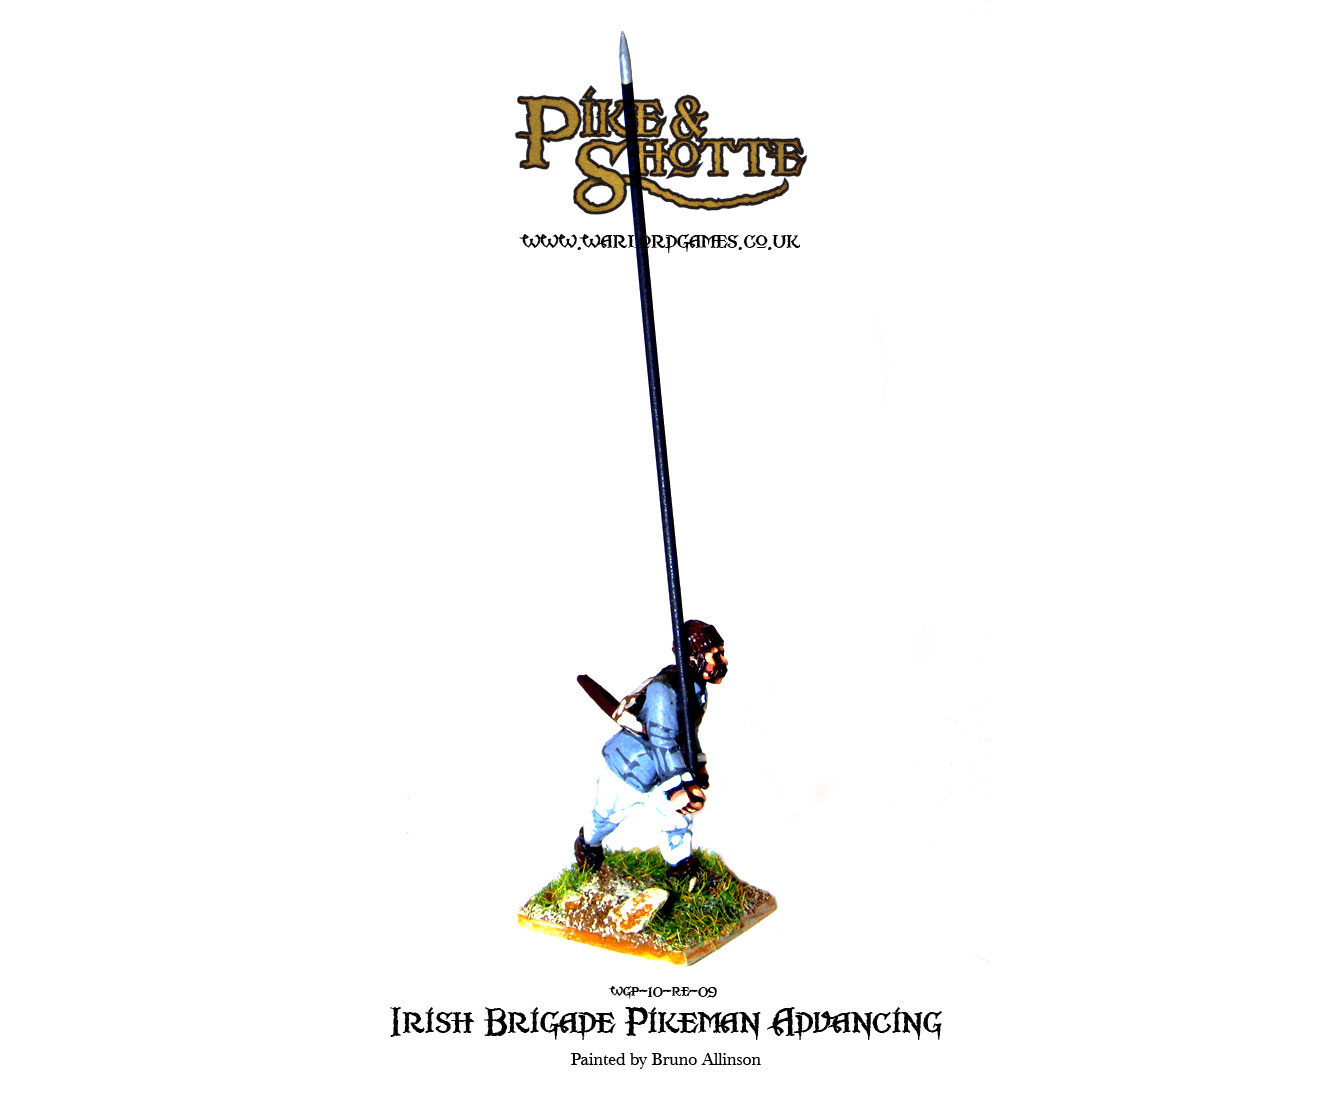 Irish Brigade Pikeman Advancing